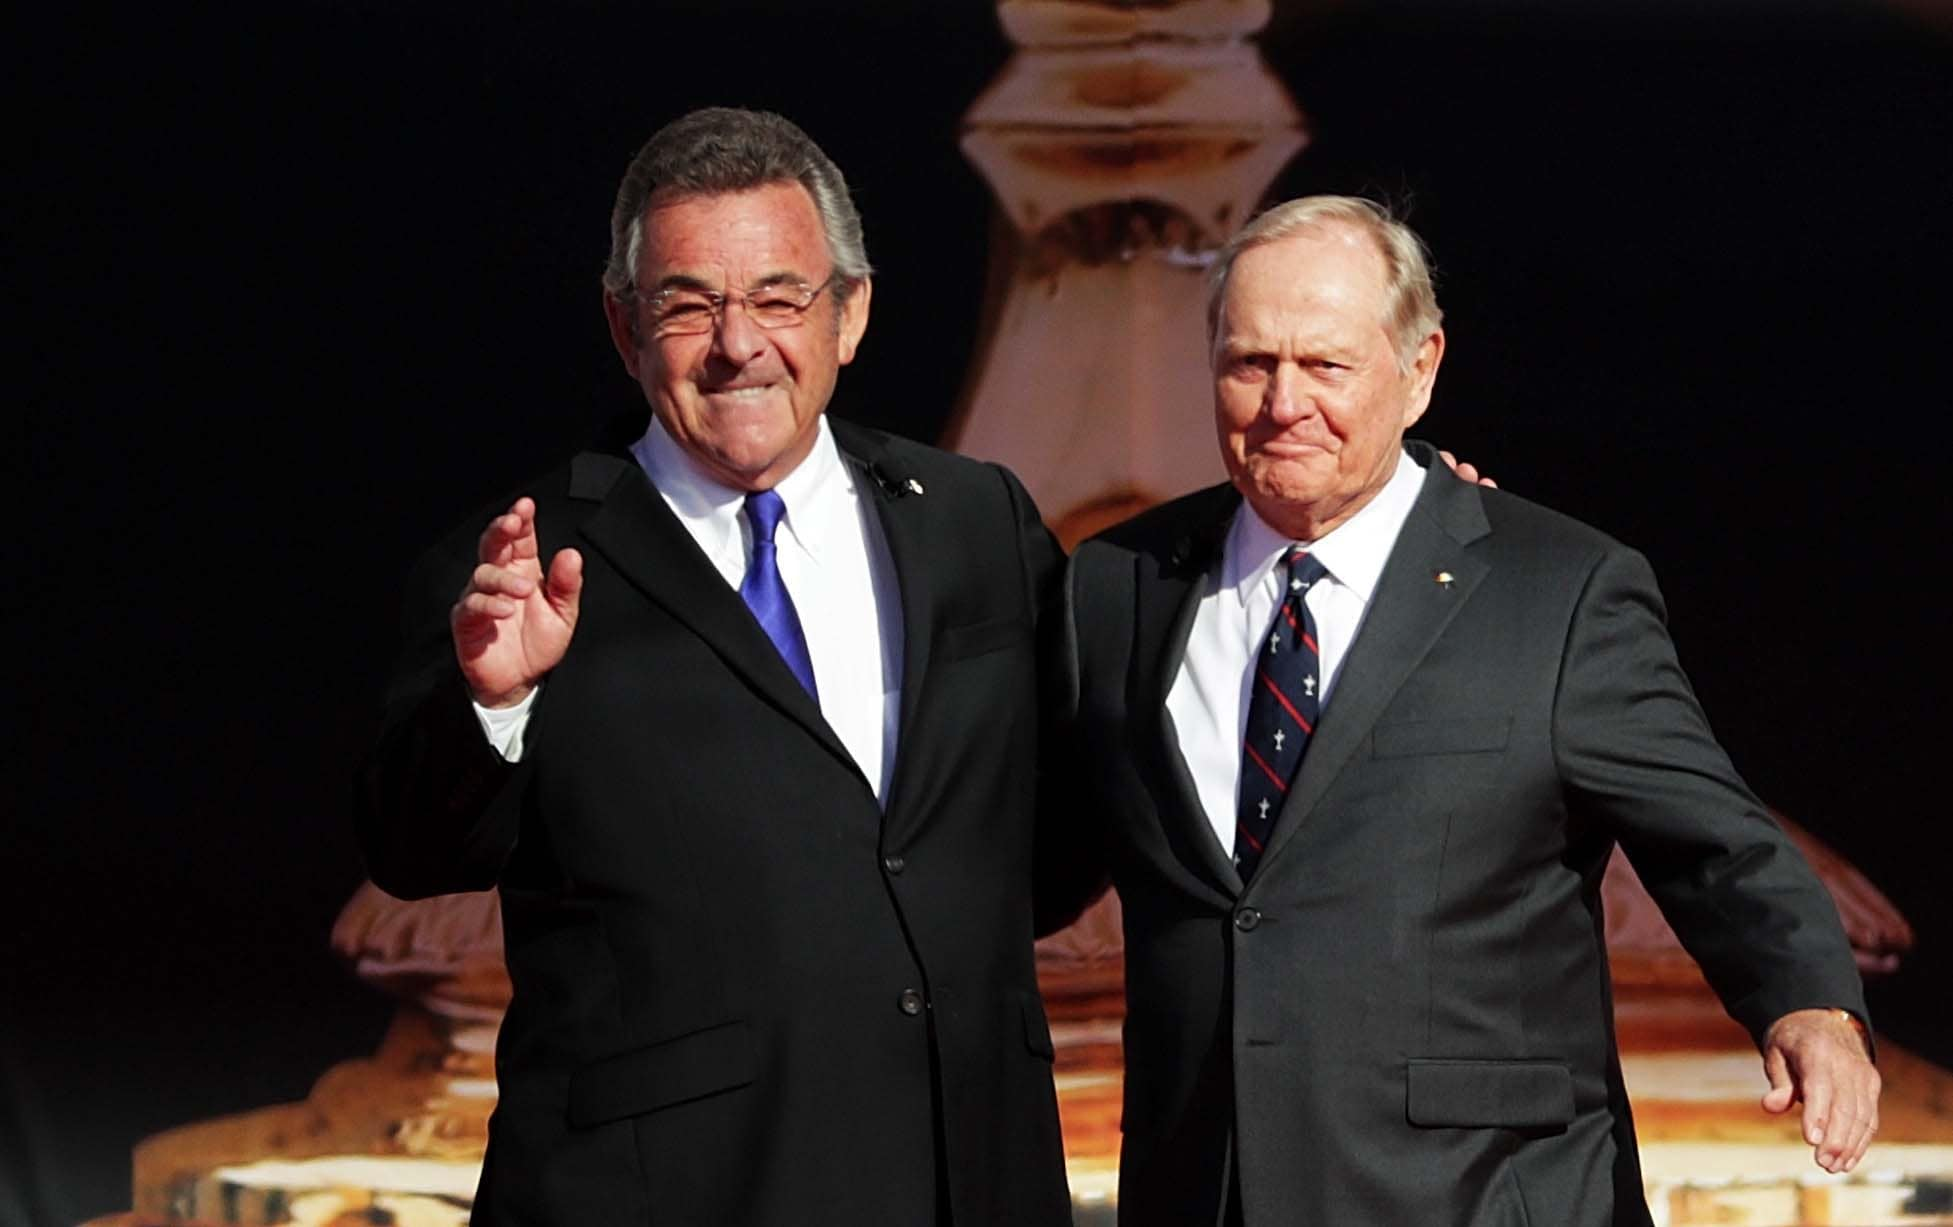 Tony Jacklin and Jack Nicklaus